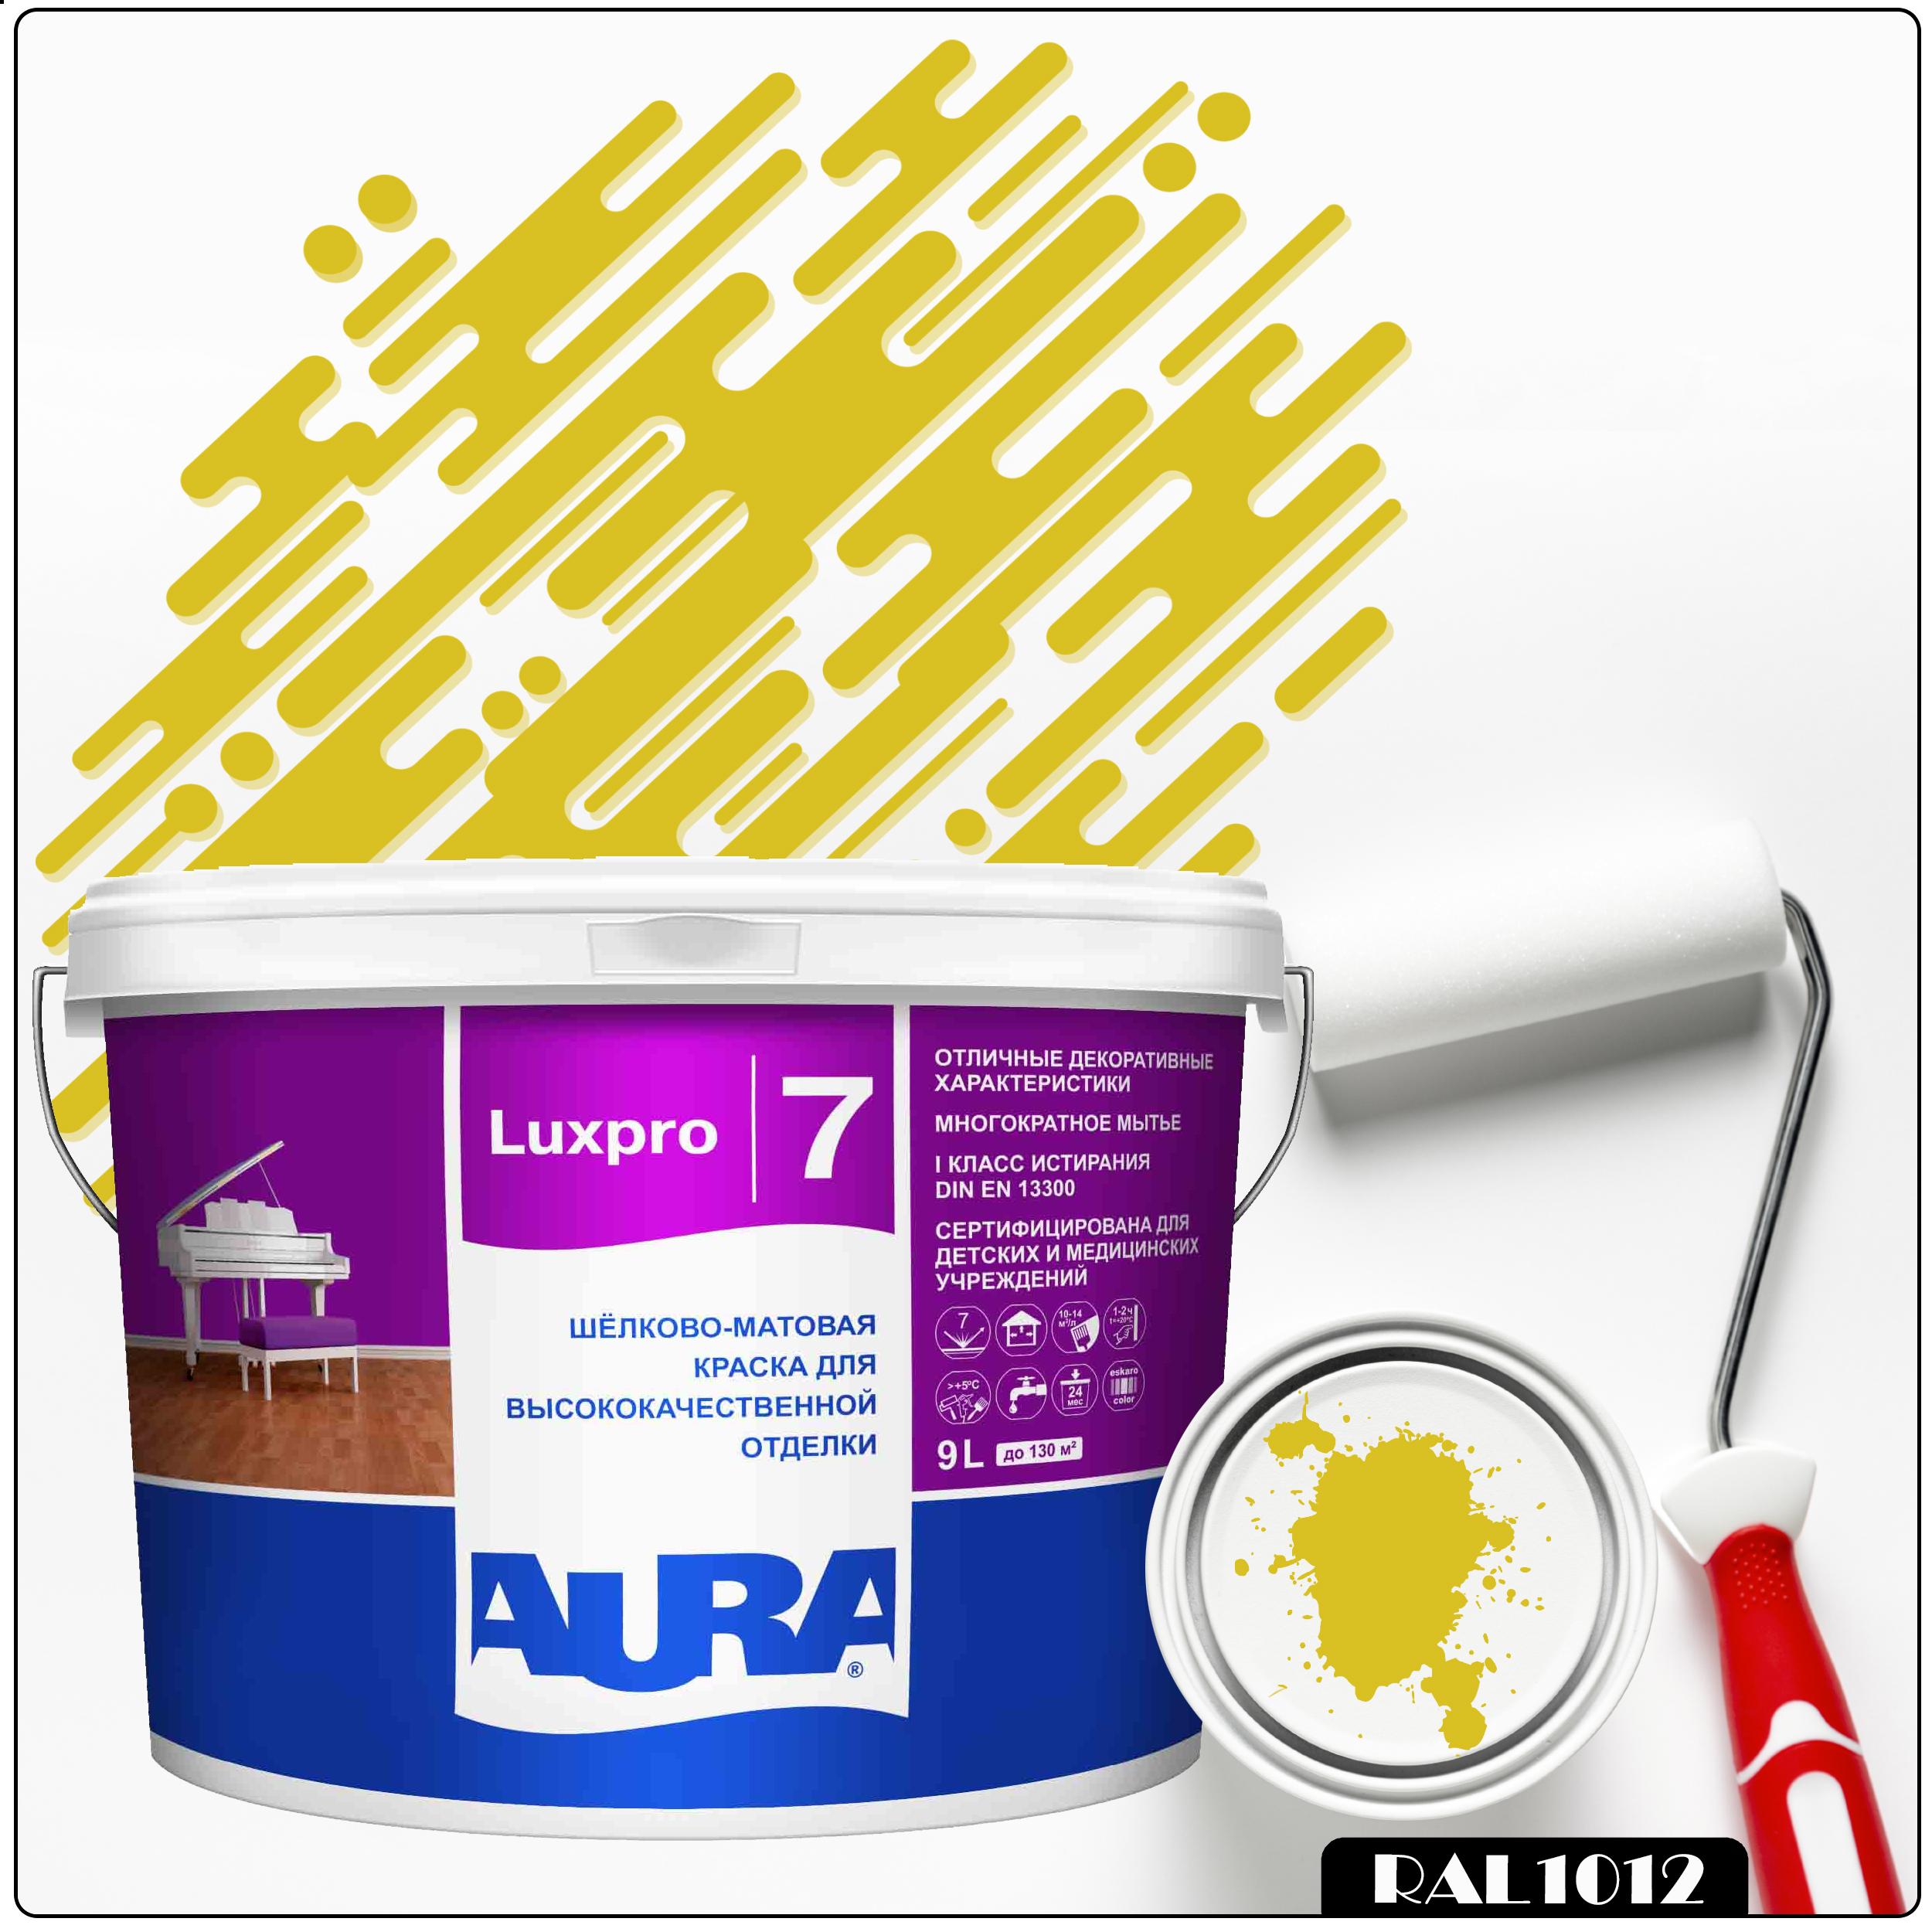 Фото 10 - Краска Aura LuxPRO 7, RAL 1012 Лимонно-жёлтый, латексная, шелково-матовая, интерьерная, 9л, Аура.